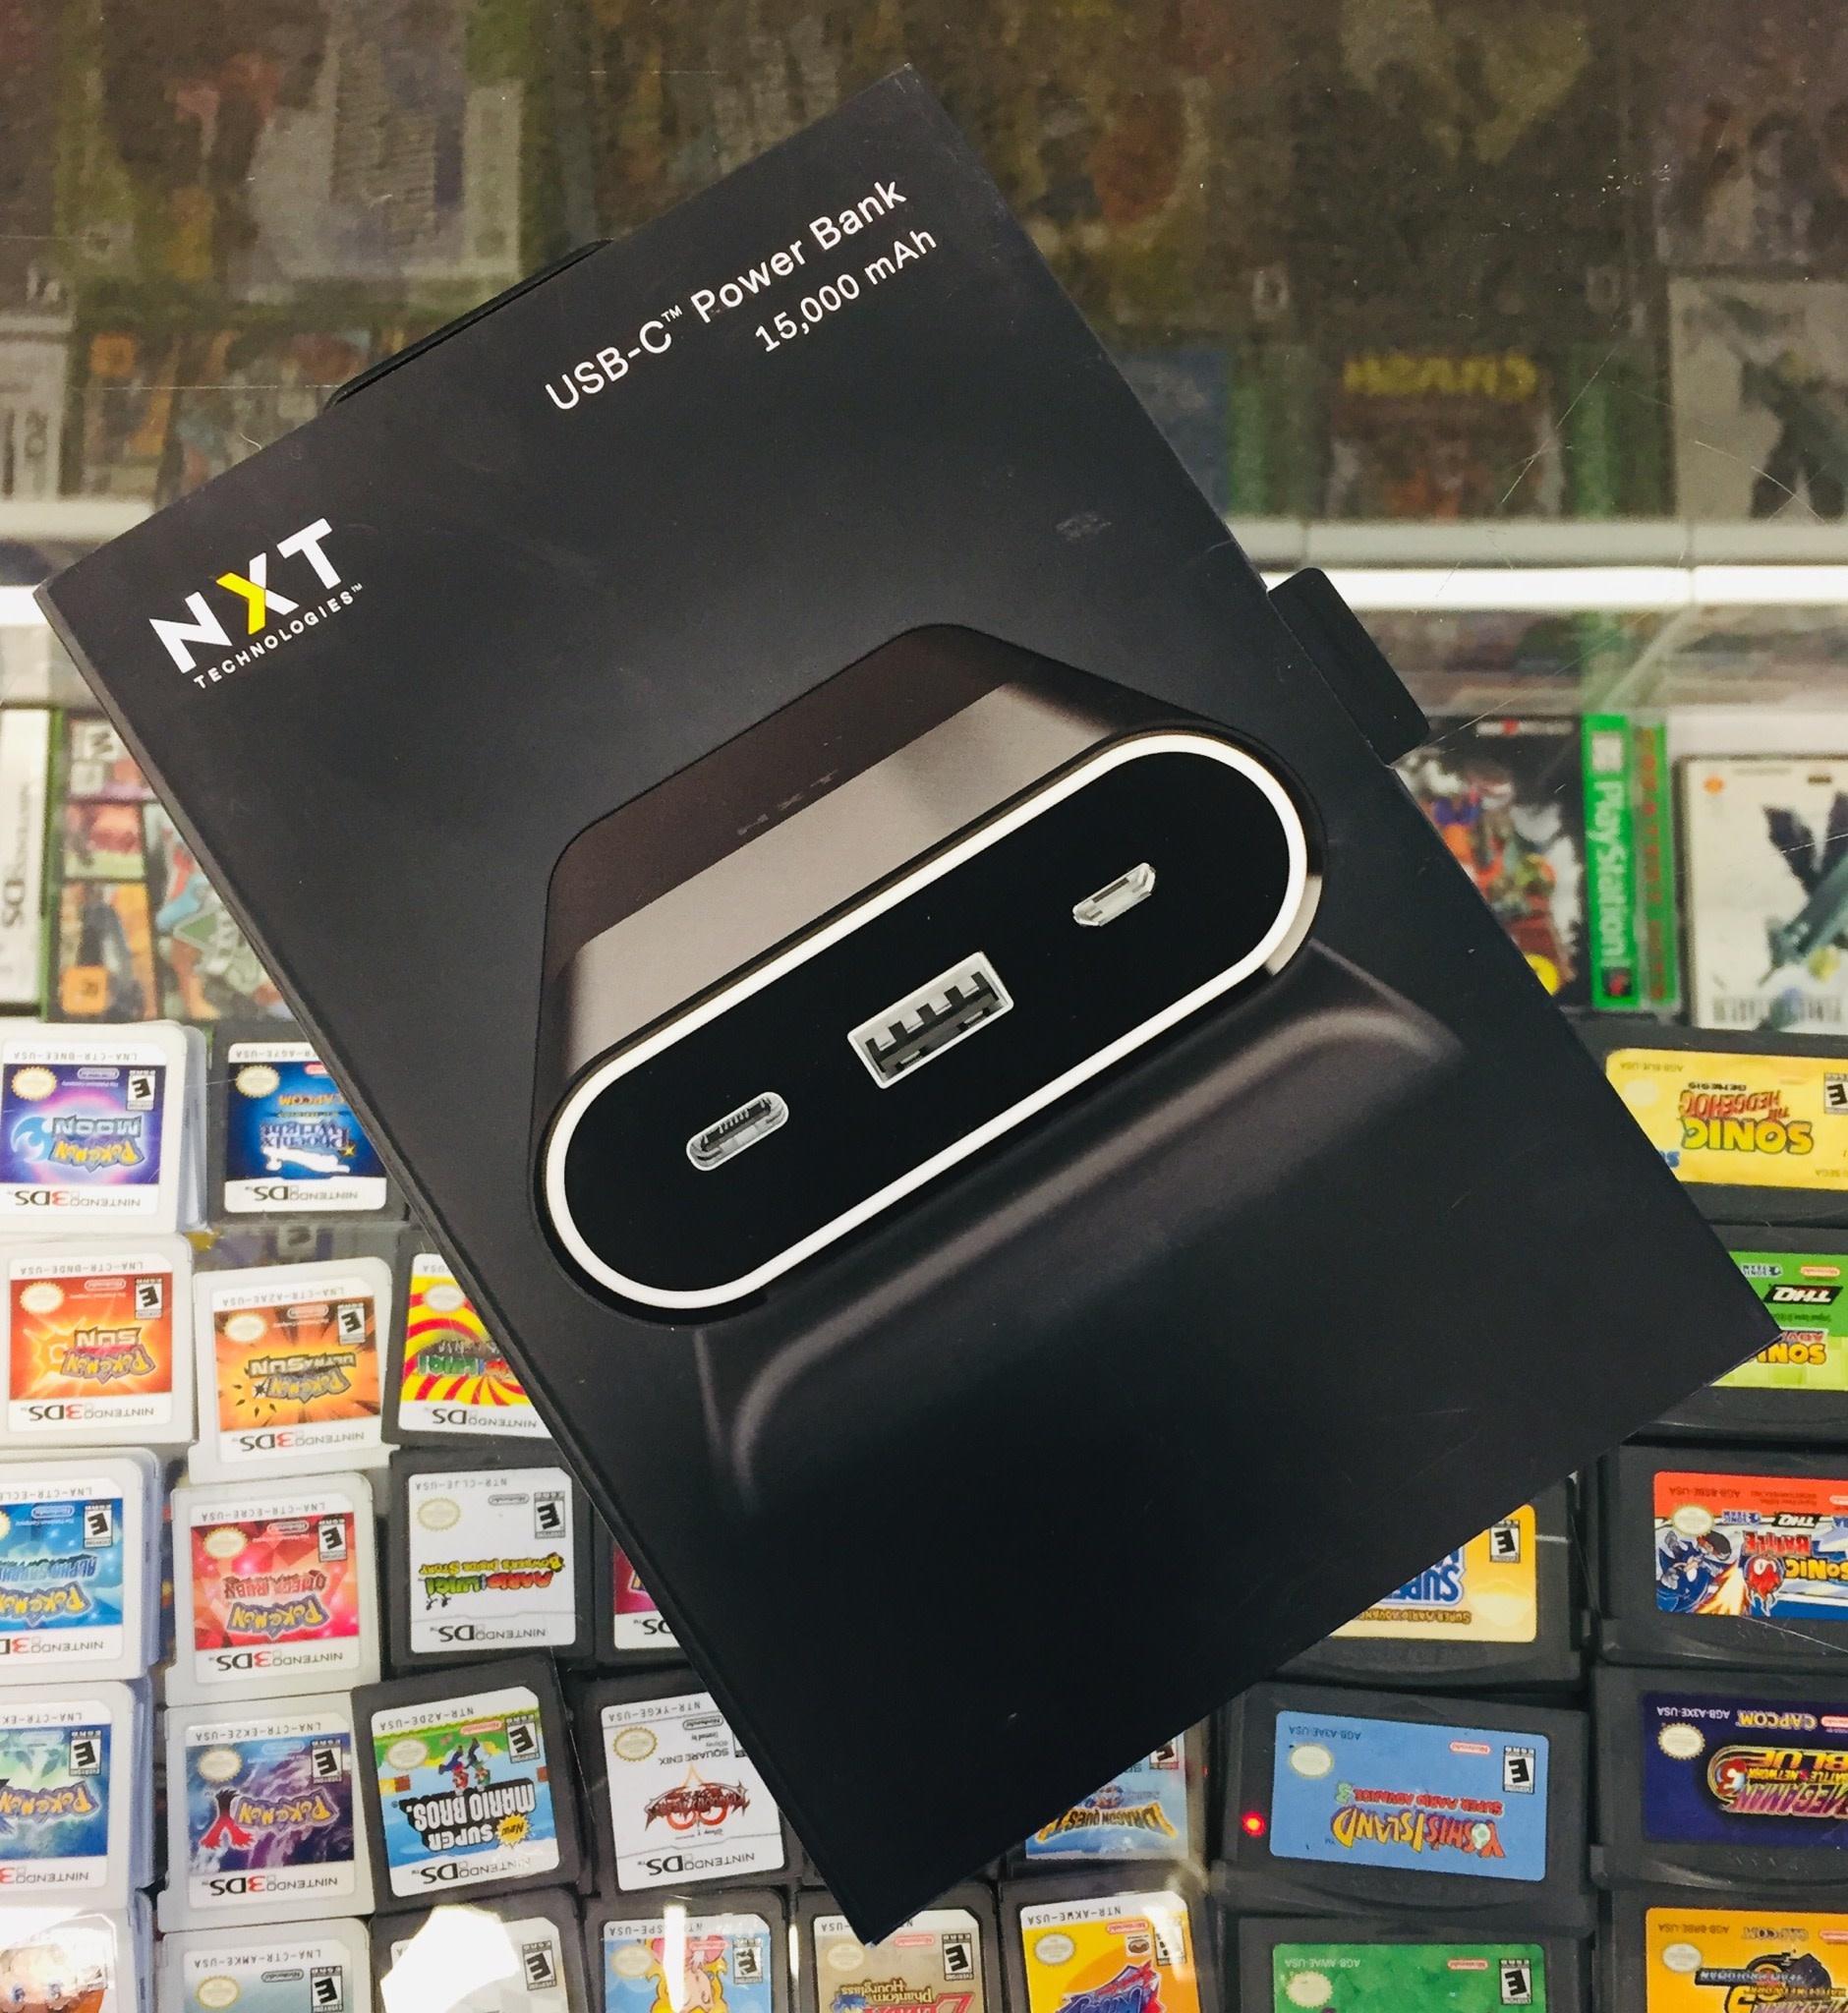 NXT Technologies 15000 mAh 2 USB Port PowerBank - Black